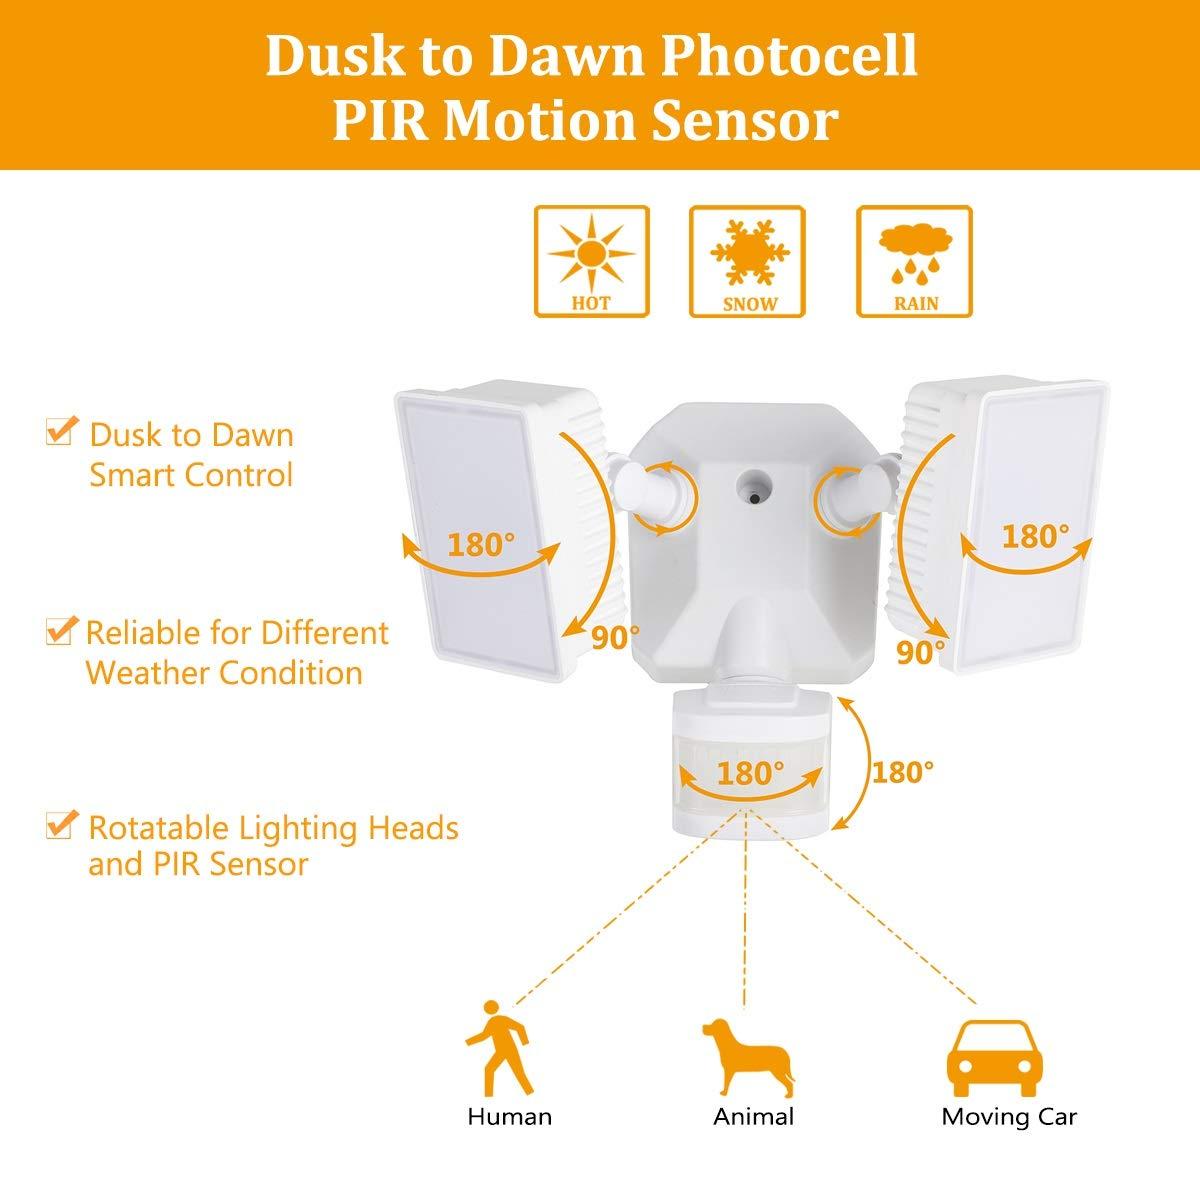 Dusk-to-Dawn Security Lights with Motion Sensor, 5000K Daylight White, ETL Certified, IP65 Outdoor, 110V 120V Dual-Head Rotatable LED Flood Light for Porch, Garage, Yard, Driveway, EMANER